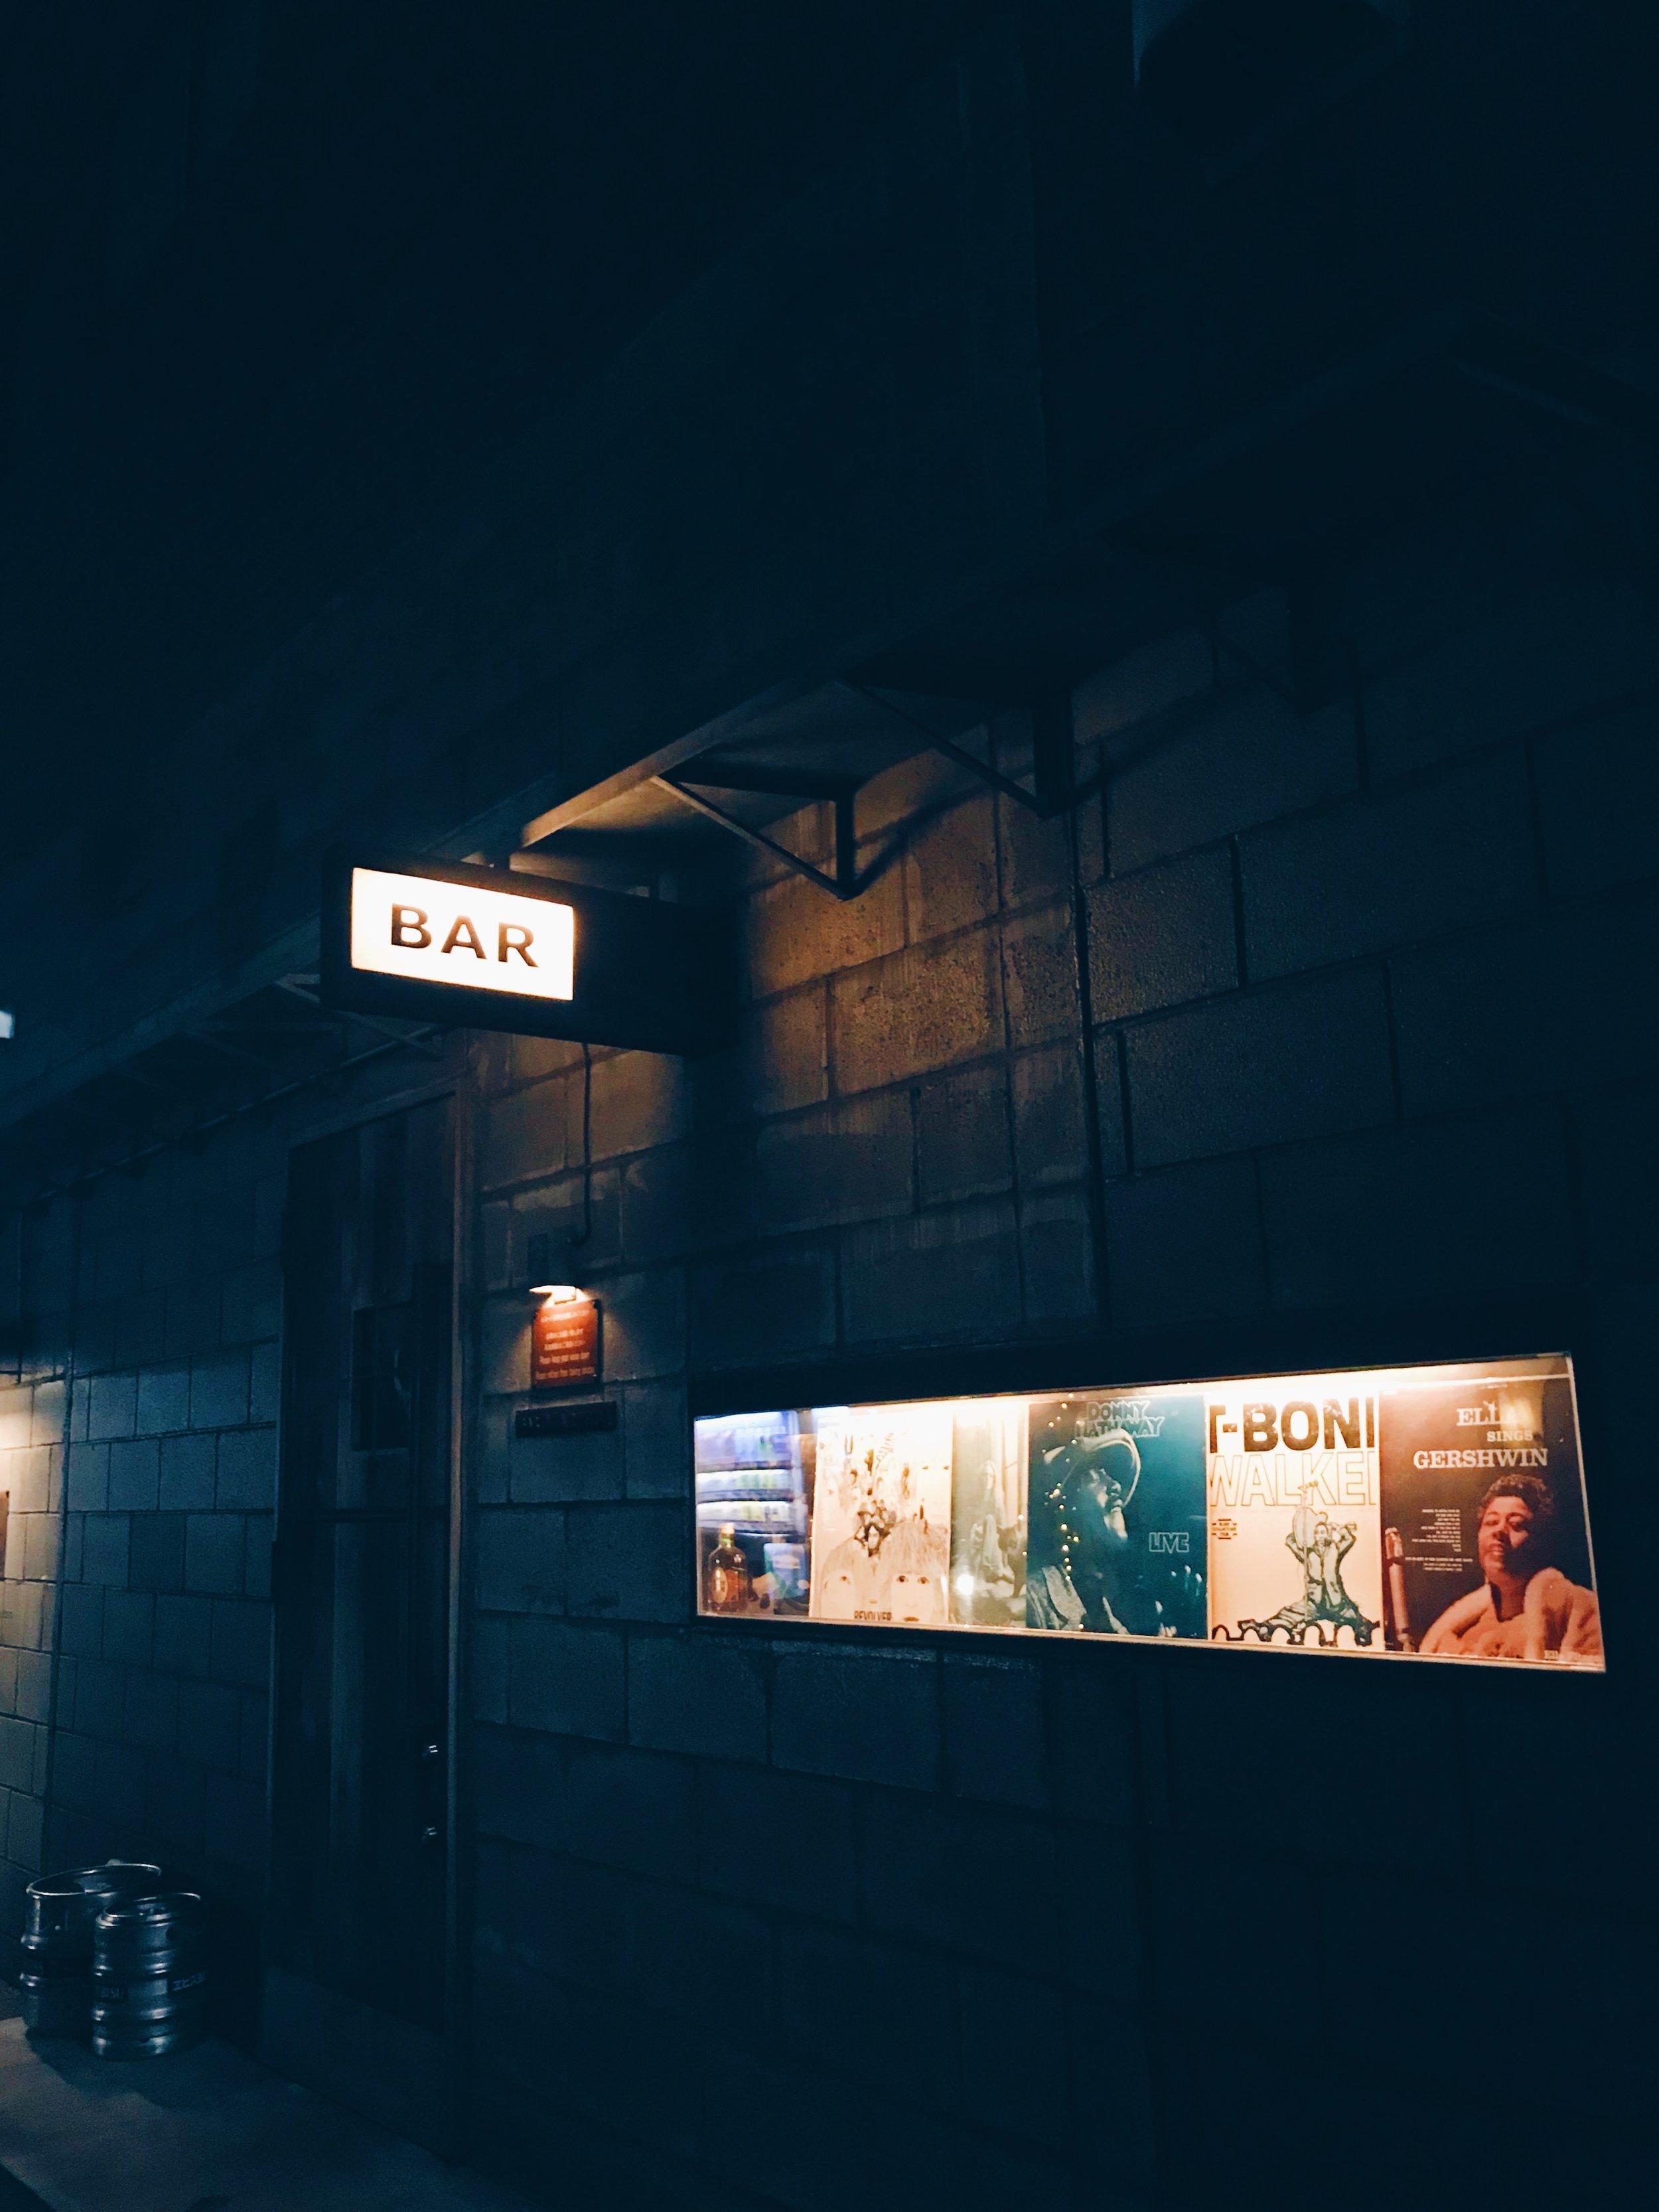 Bar Martha , also in Ebisu, is hands down my favorite bar ever now